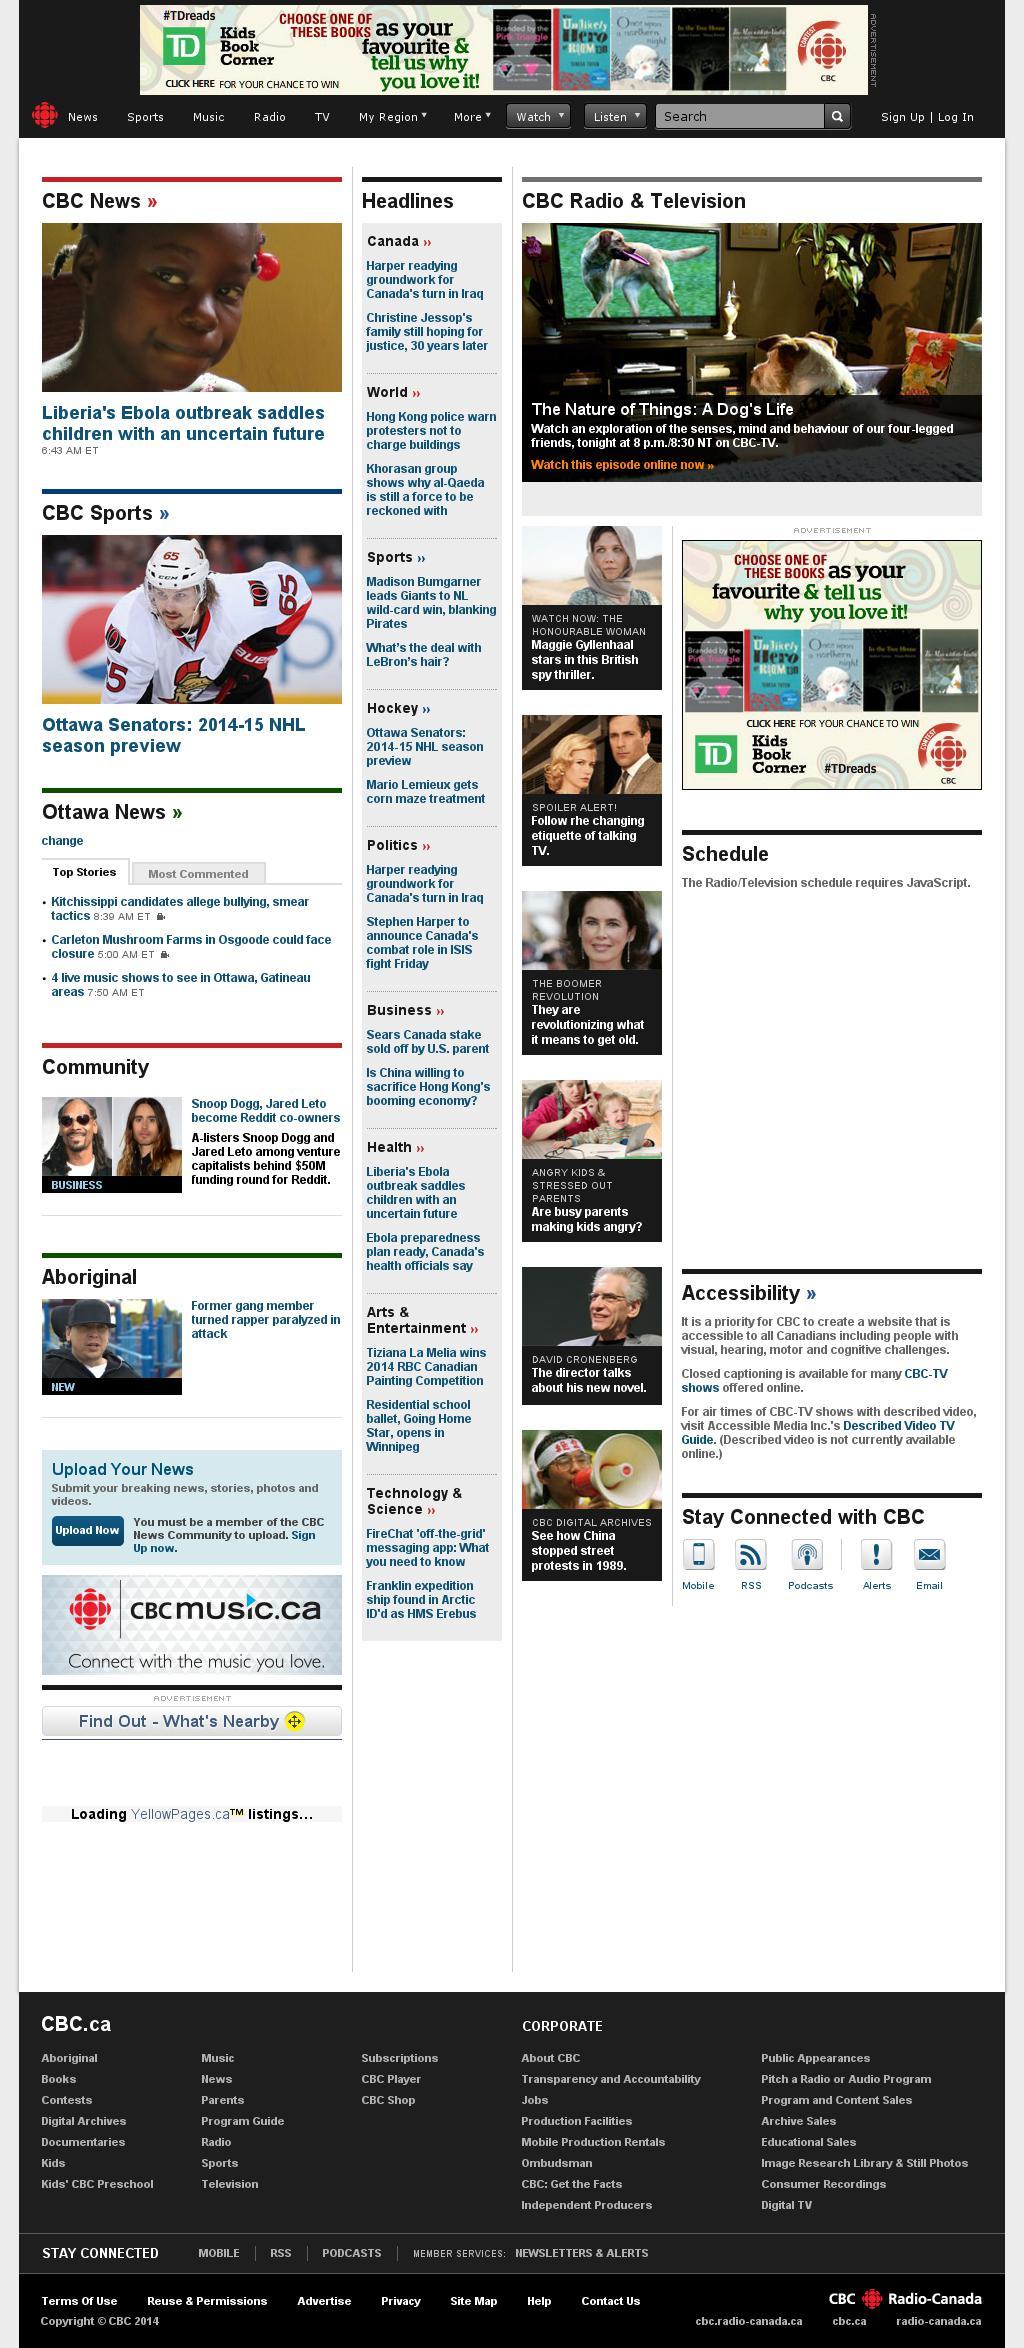 CBC at Thursday Oct. 2, 2014, 1:01 p.m. UTC